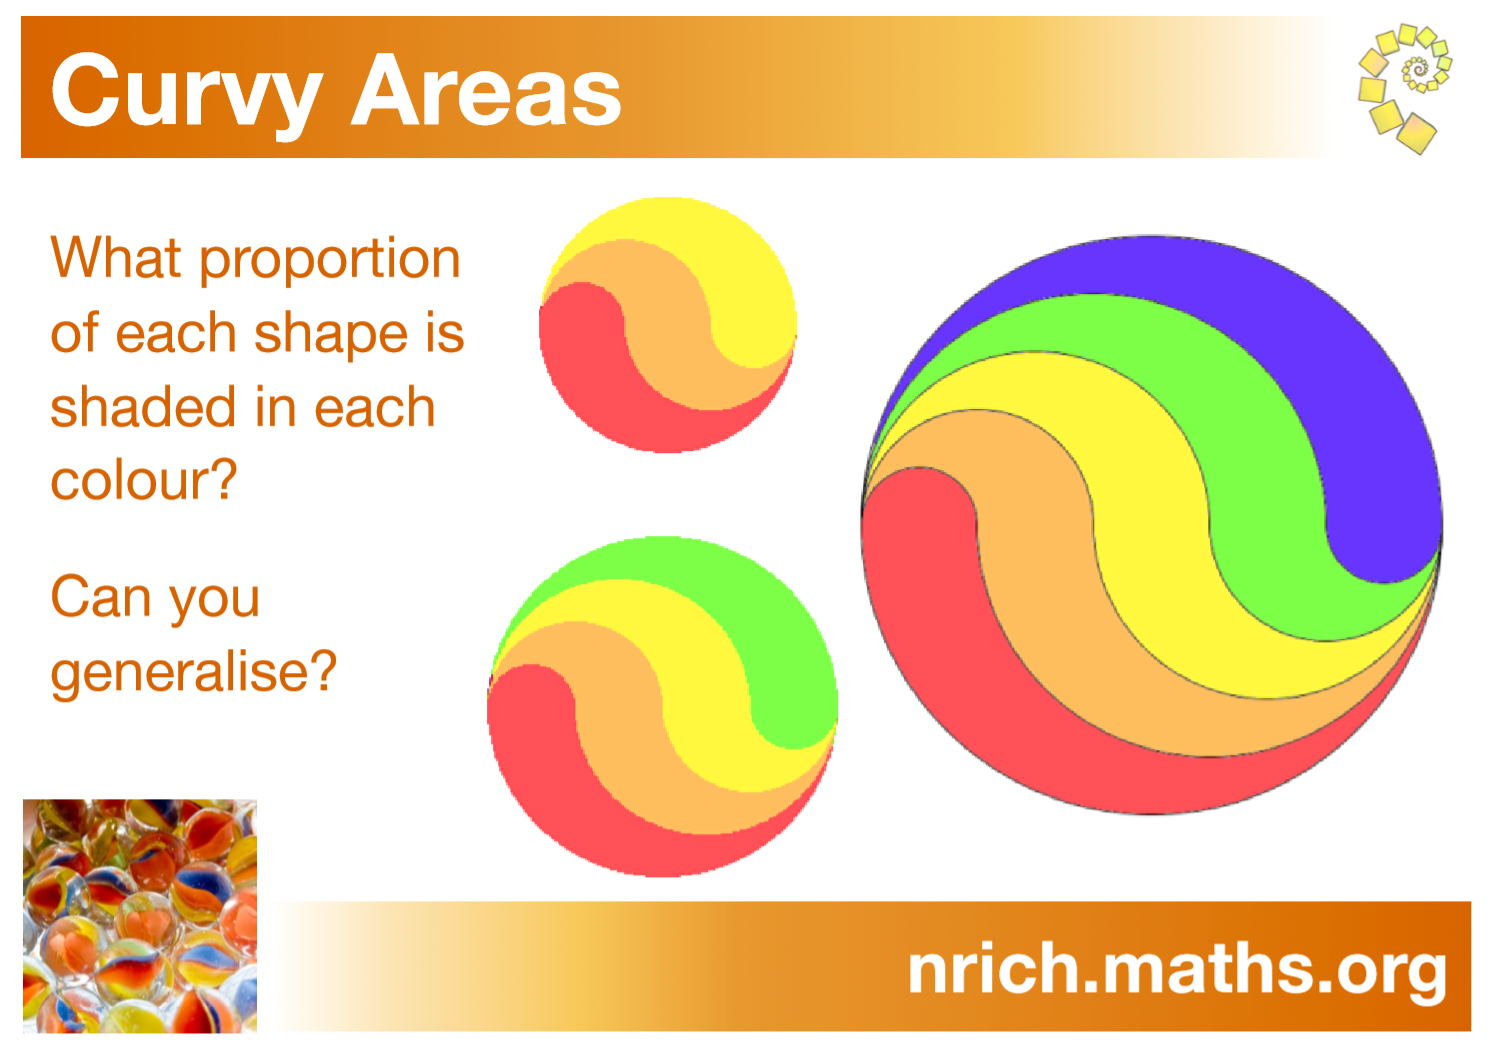 Curvy Areas Poster : nrich.maths.org